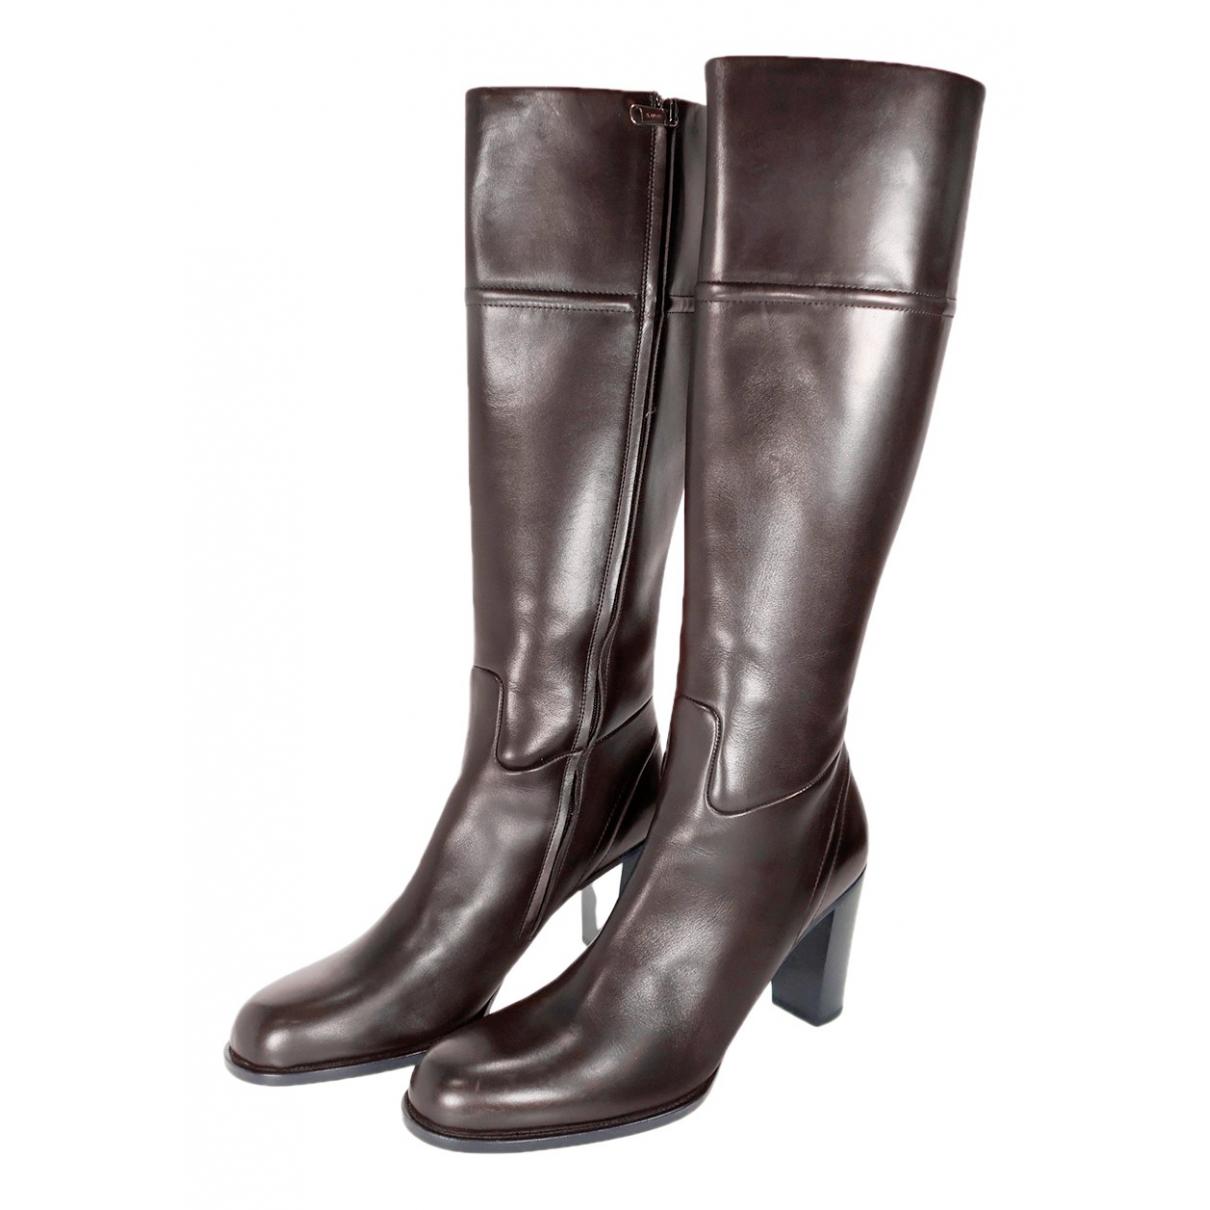 Jil Sander N Brown Leather Boots for Women 40 EU